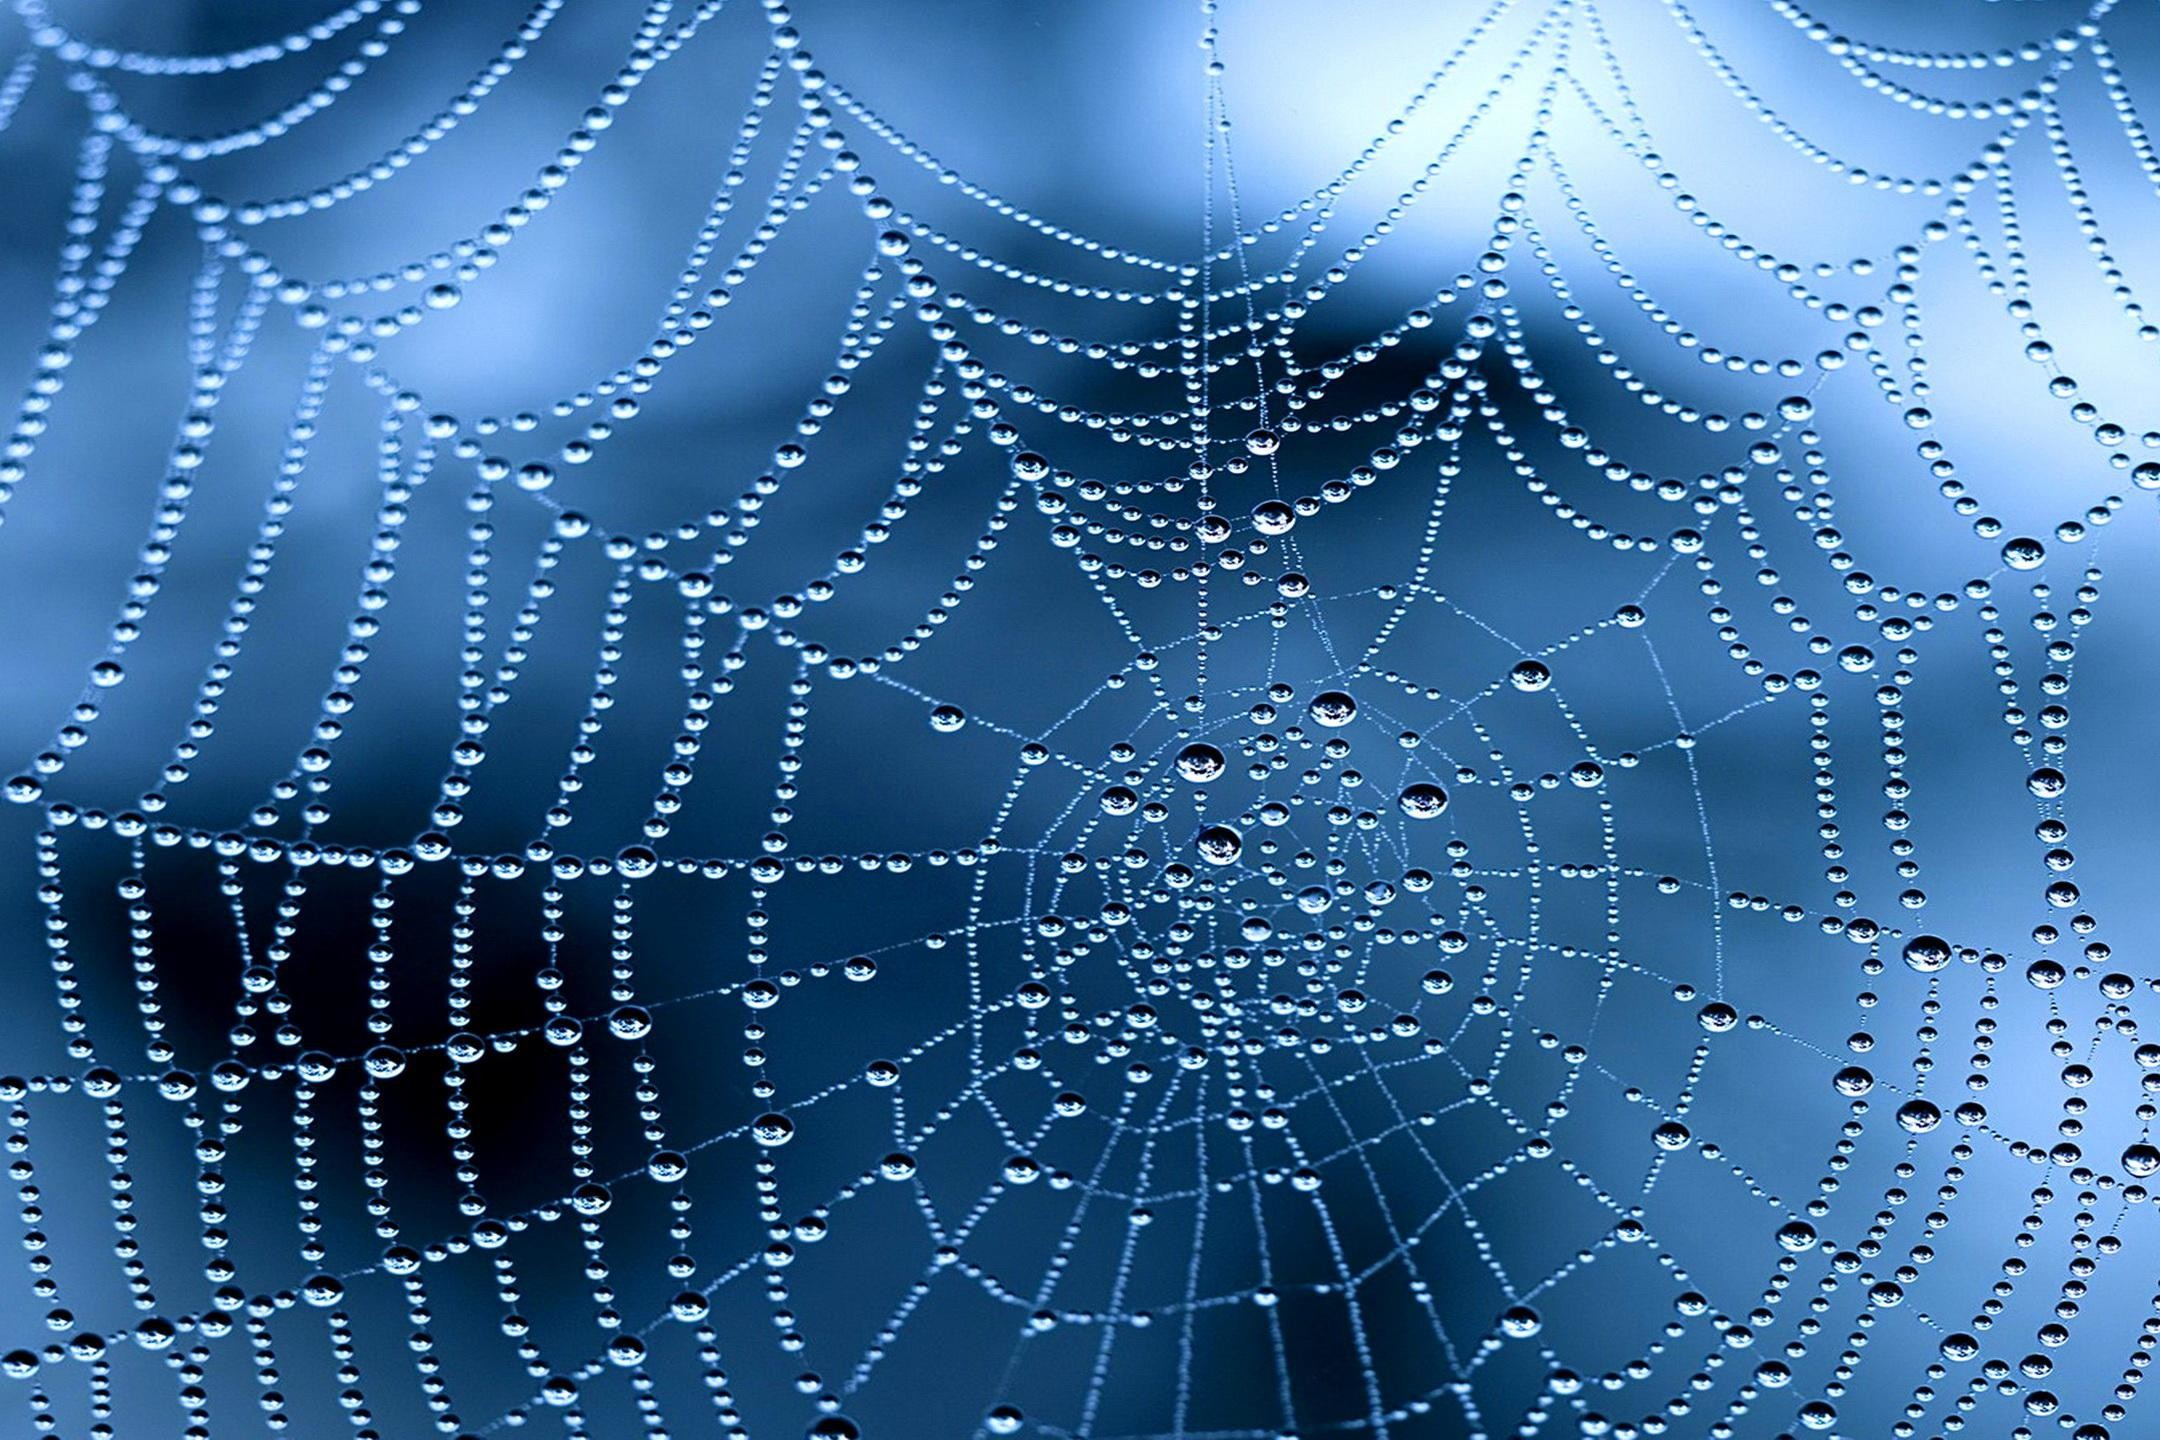 Photography – Spider Web Close-Up Water Drop Dew Drop Wallpaper